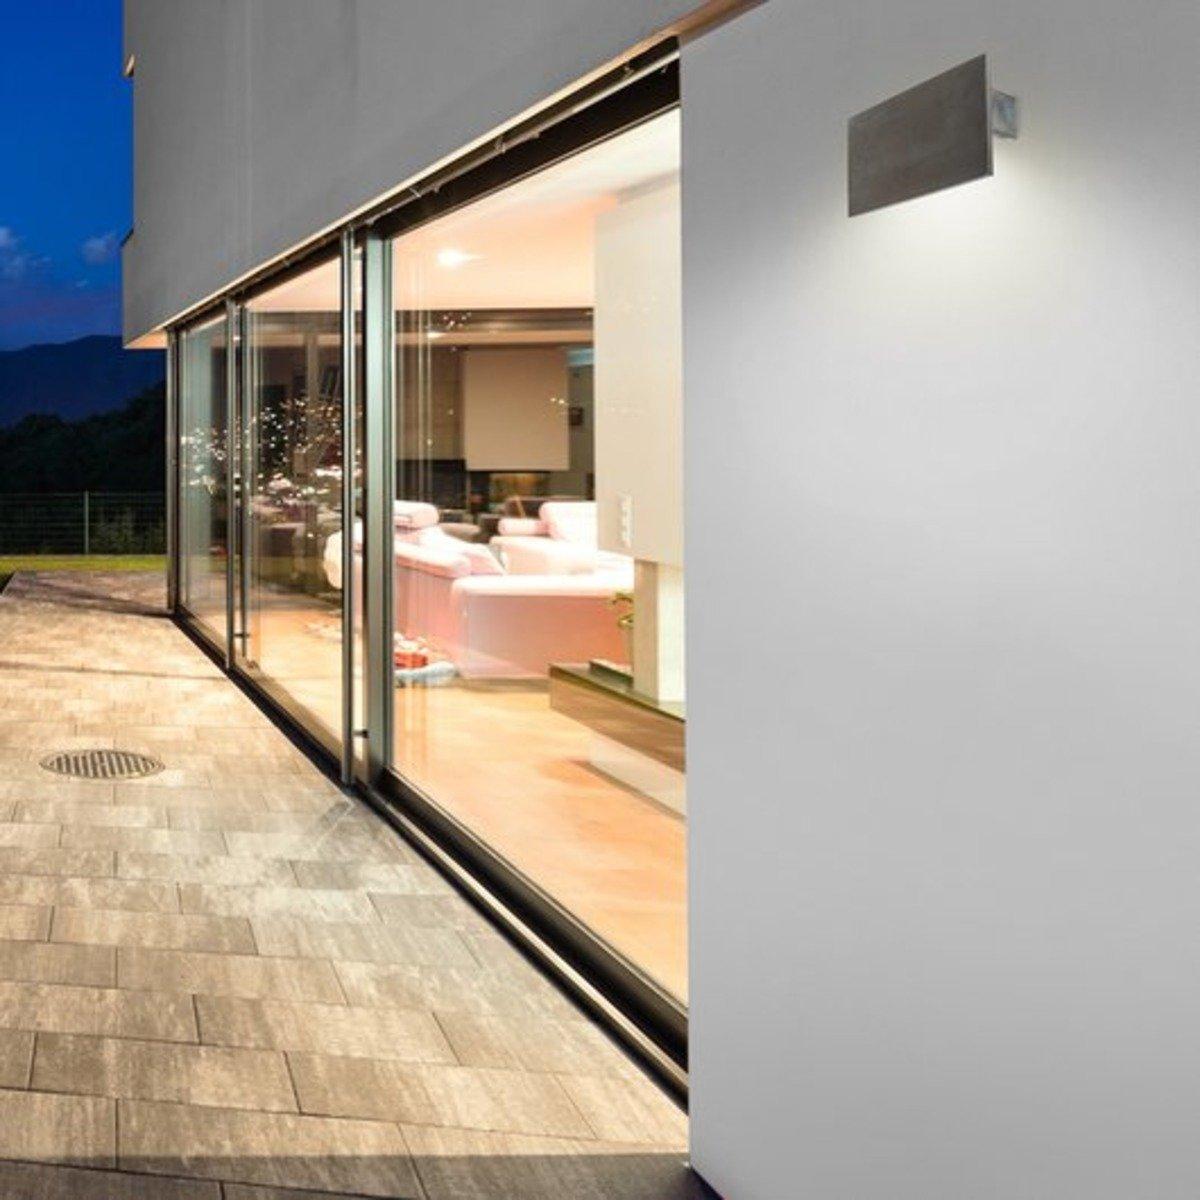 Concrete Collection Lighting - Bullard Bollards (9)